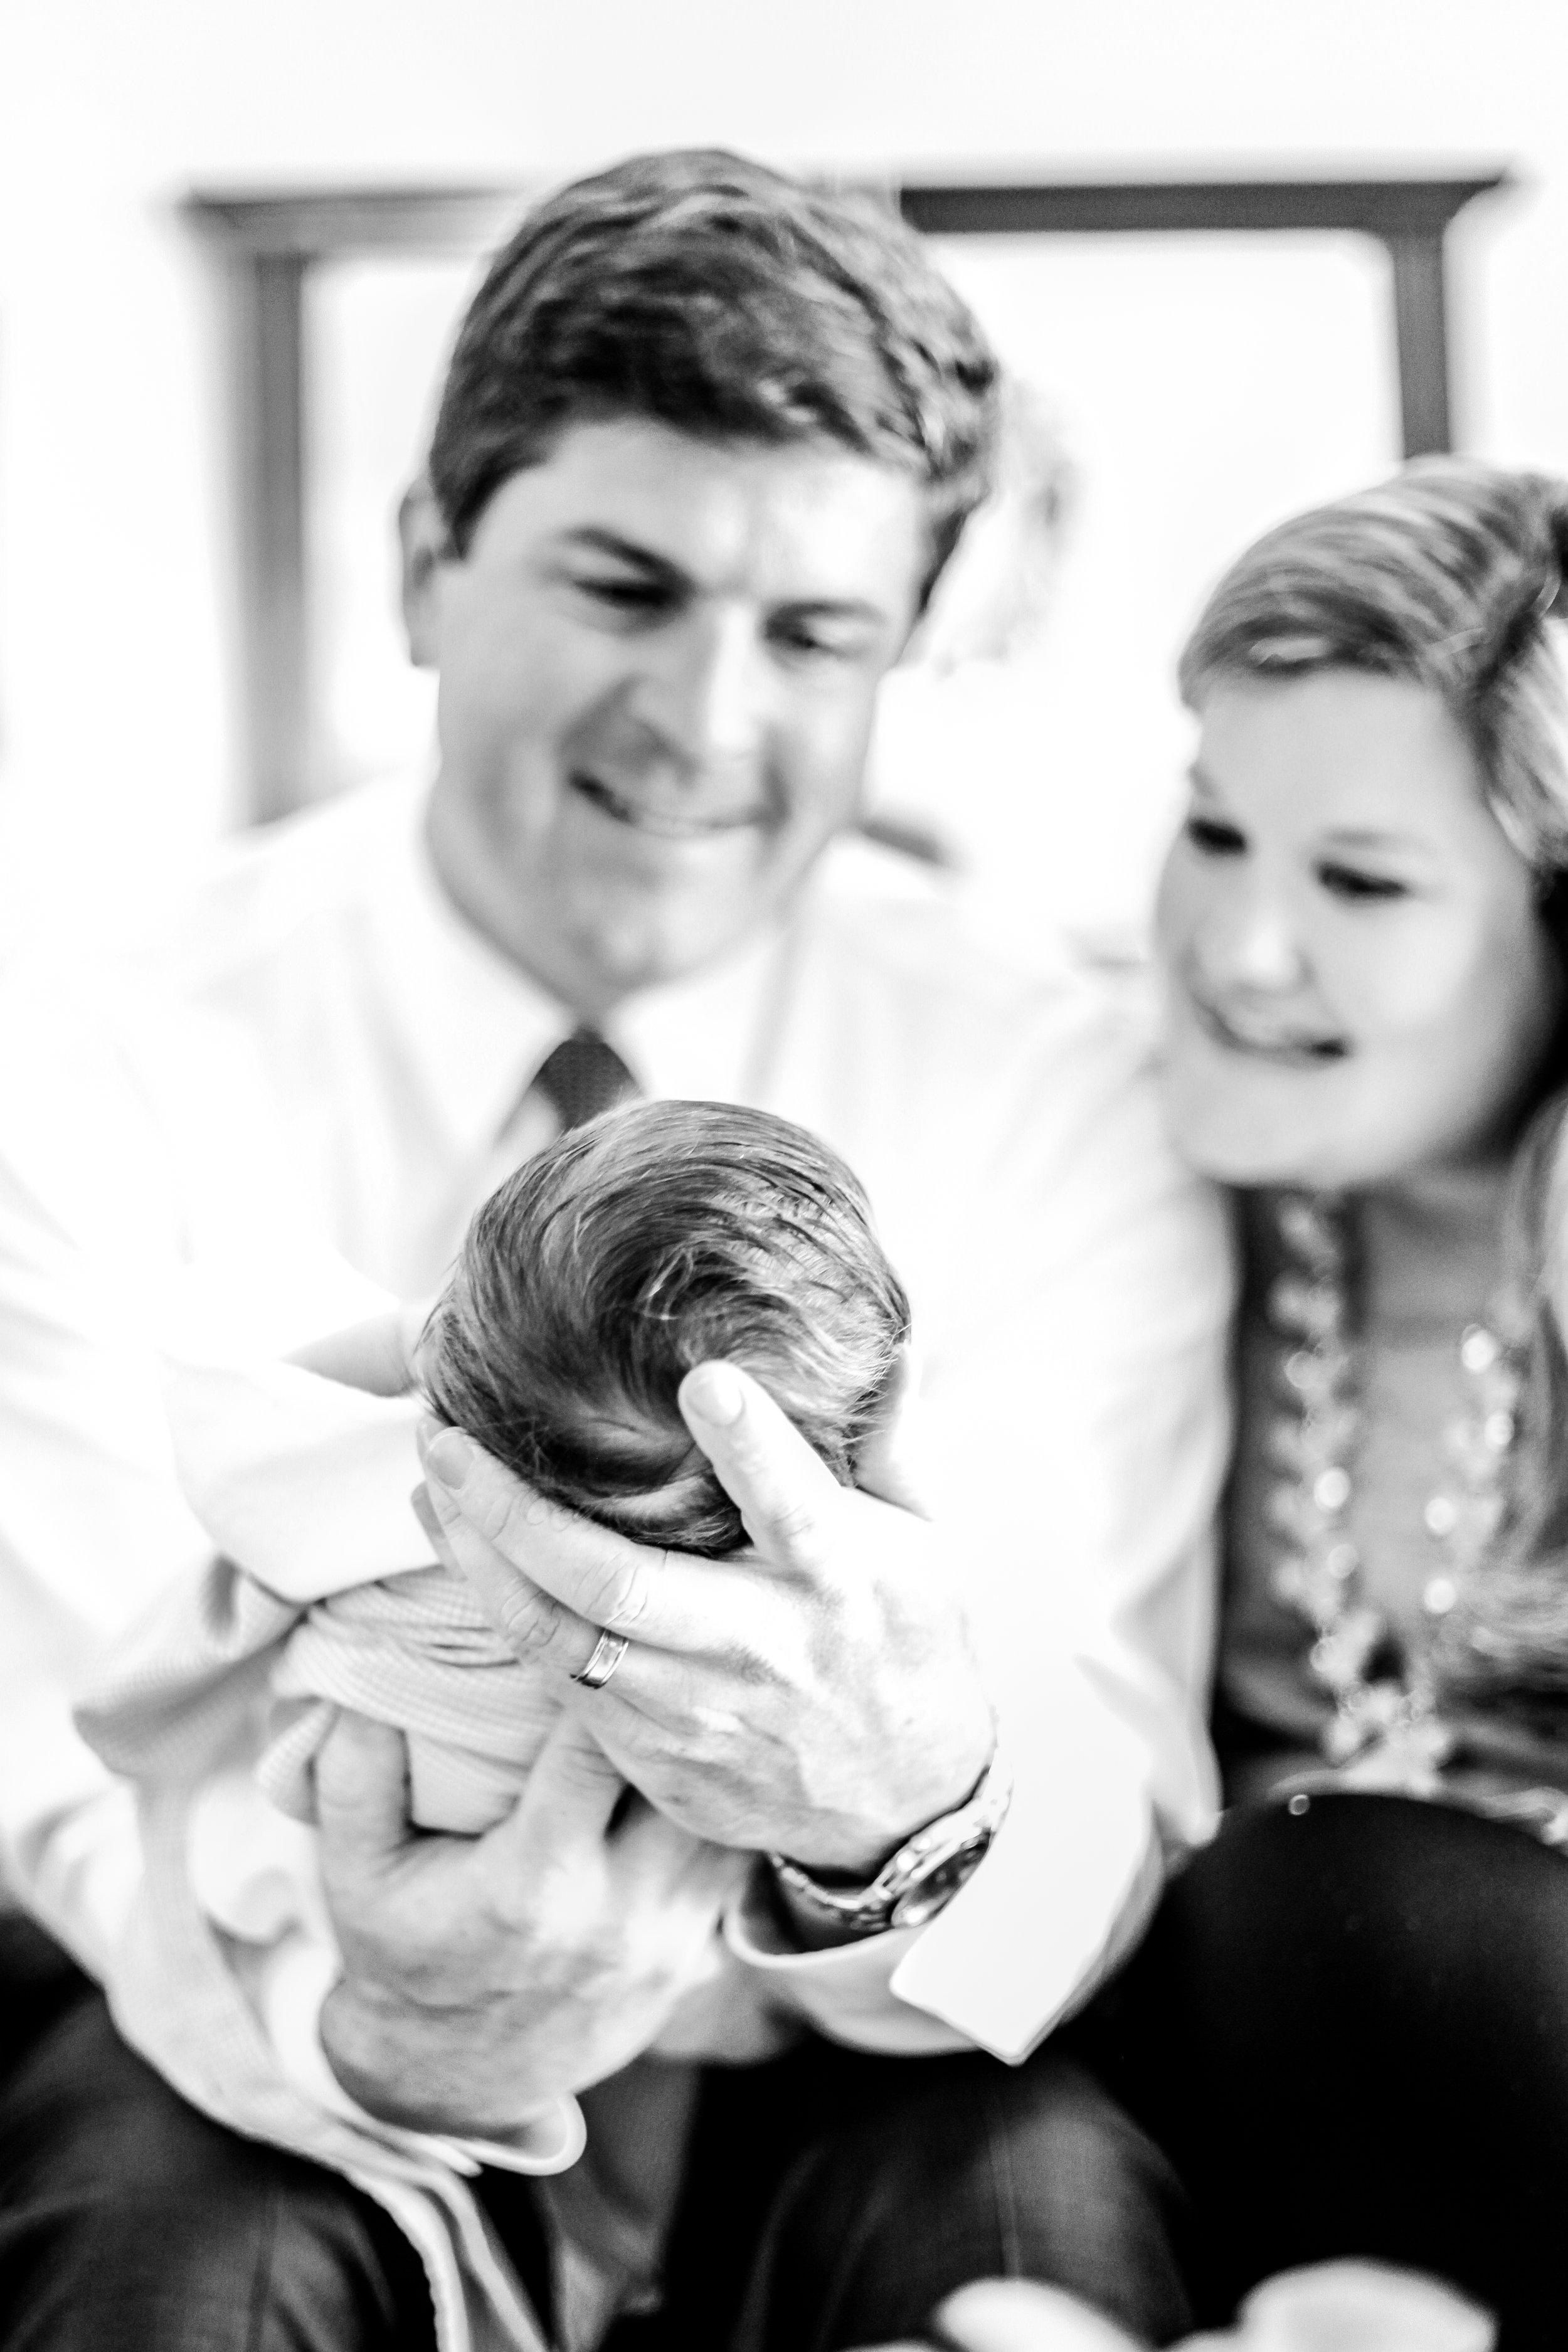 brookhaven newborn photography-17.jpg